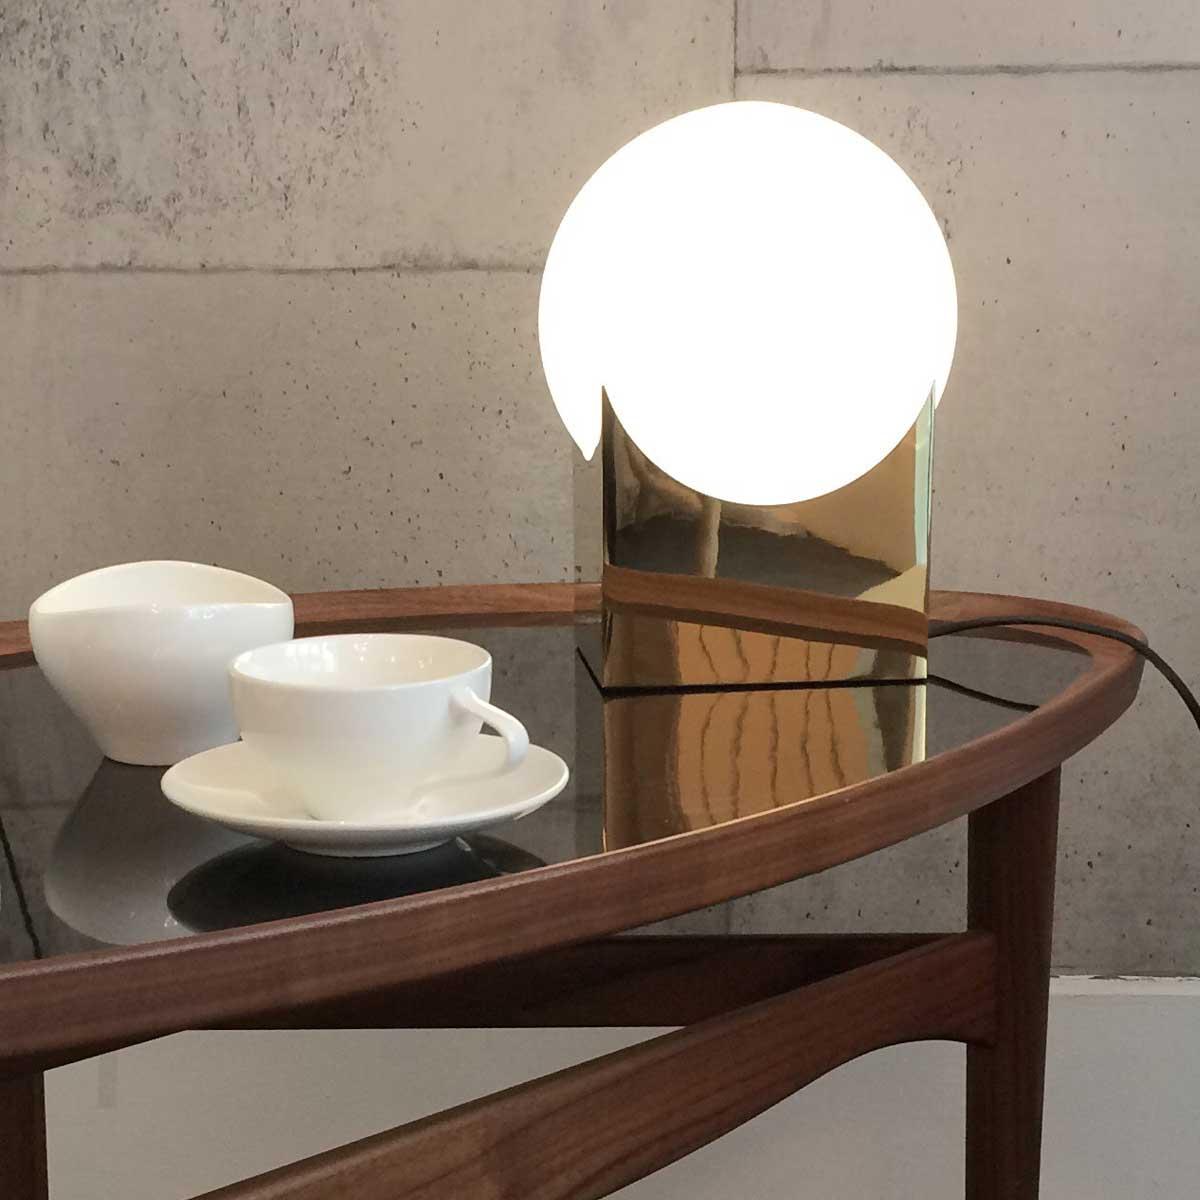 Atlas / Karl Zahn, glass table lamp with metal frame